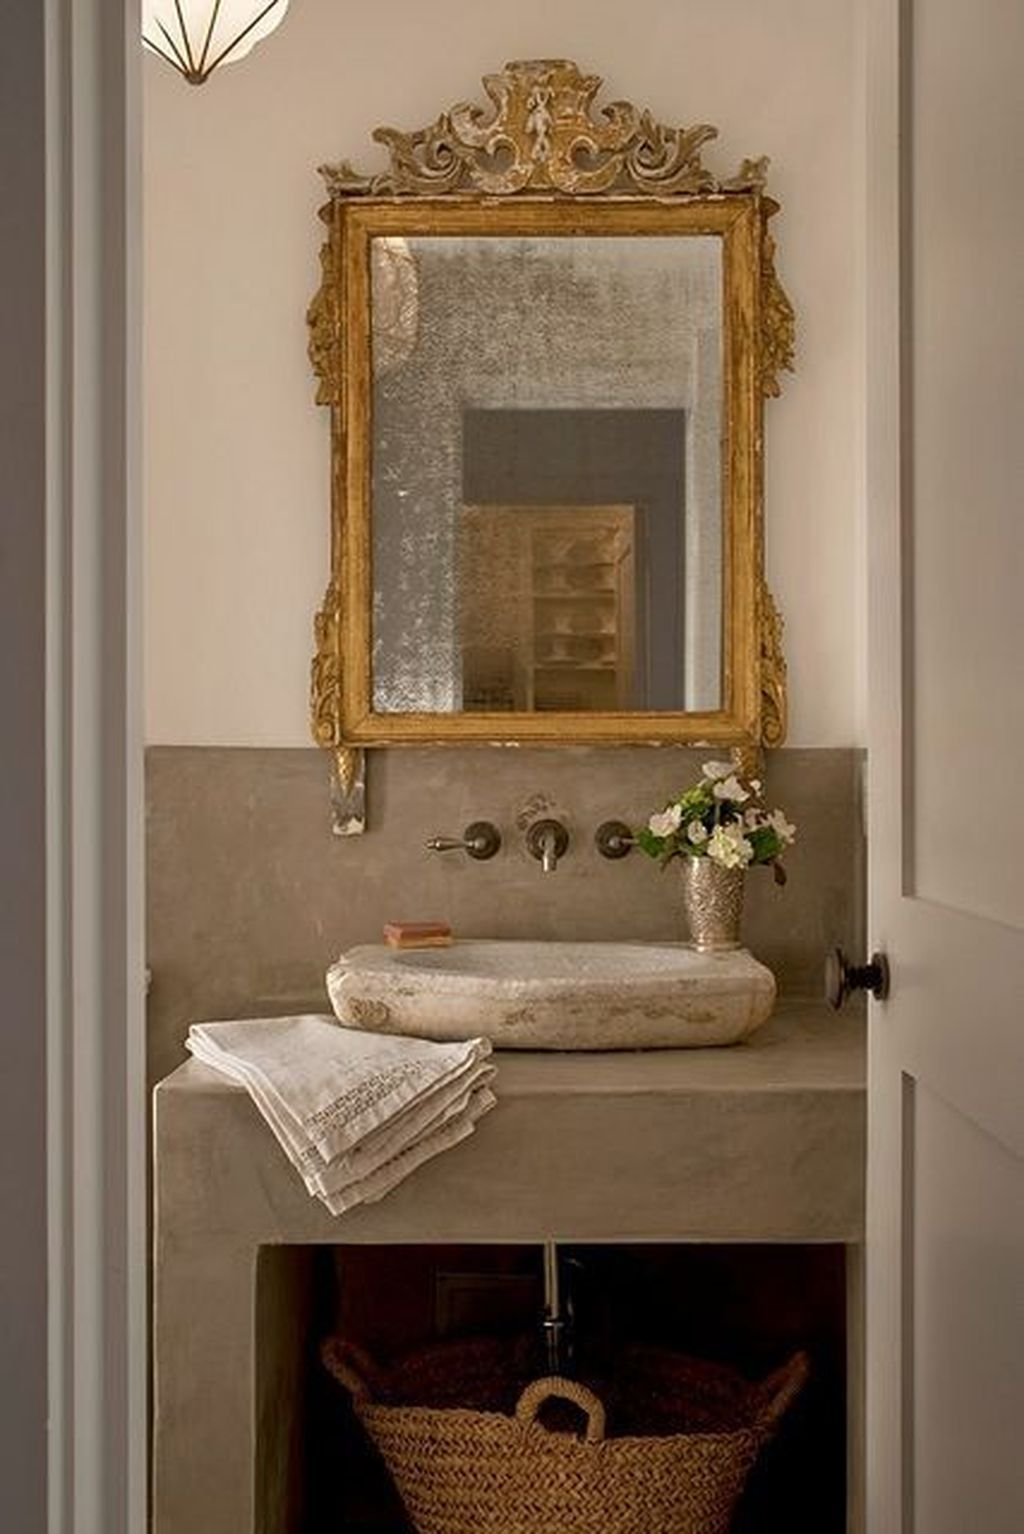 Antique Mirrors In A Bathroom Adding Charm Character Bathroom Inspiration Shabby Chic Bathroom Bathroom Design